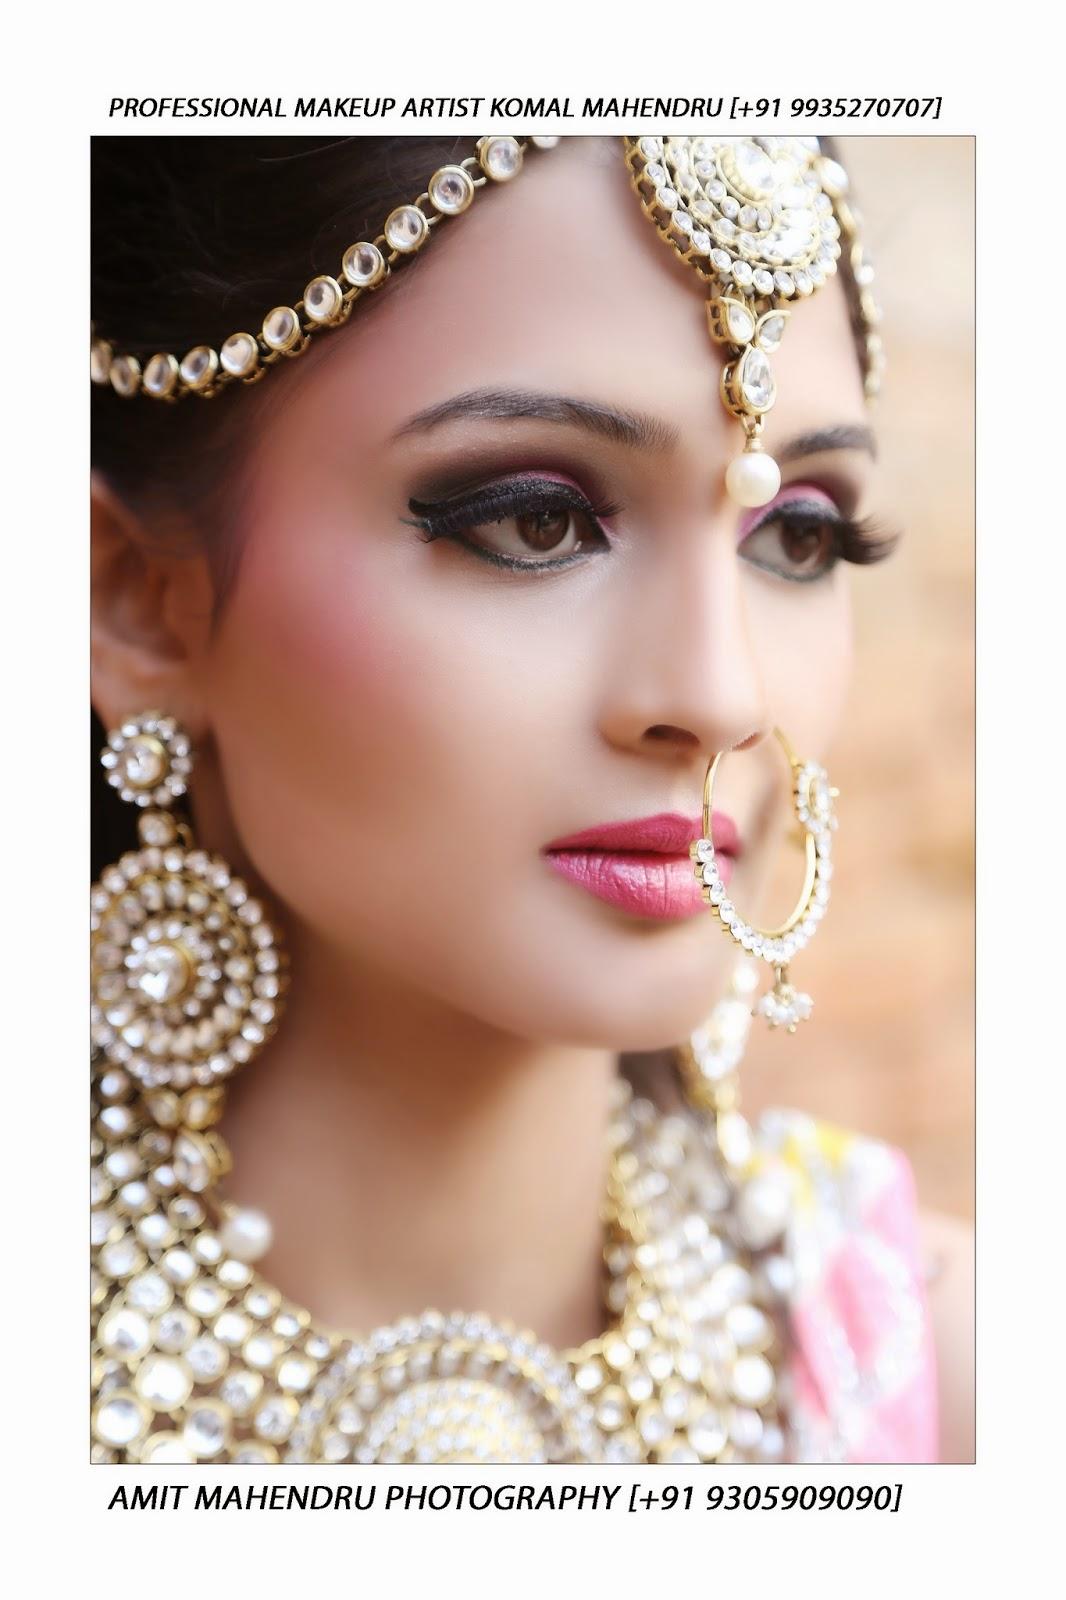 Komal mahendru s professional makeup lucknow india bridal makeup - Best Makeup Artist In Lucknow